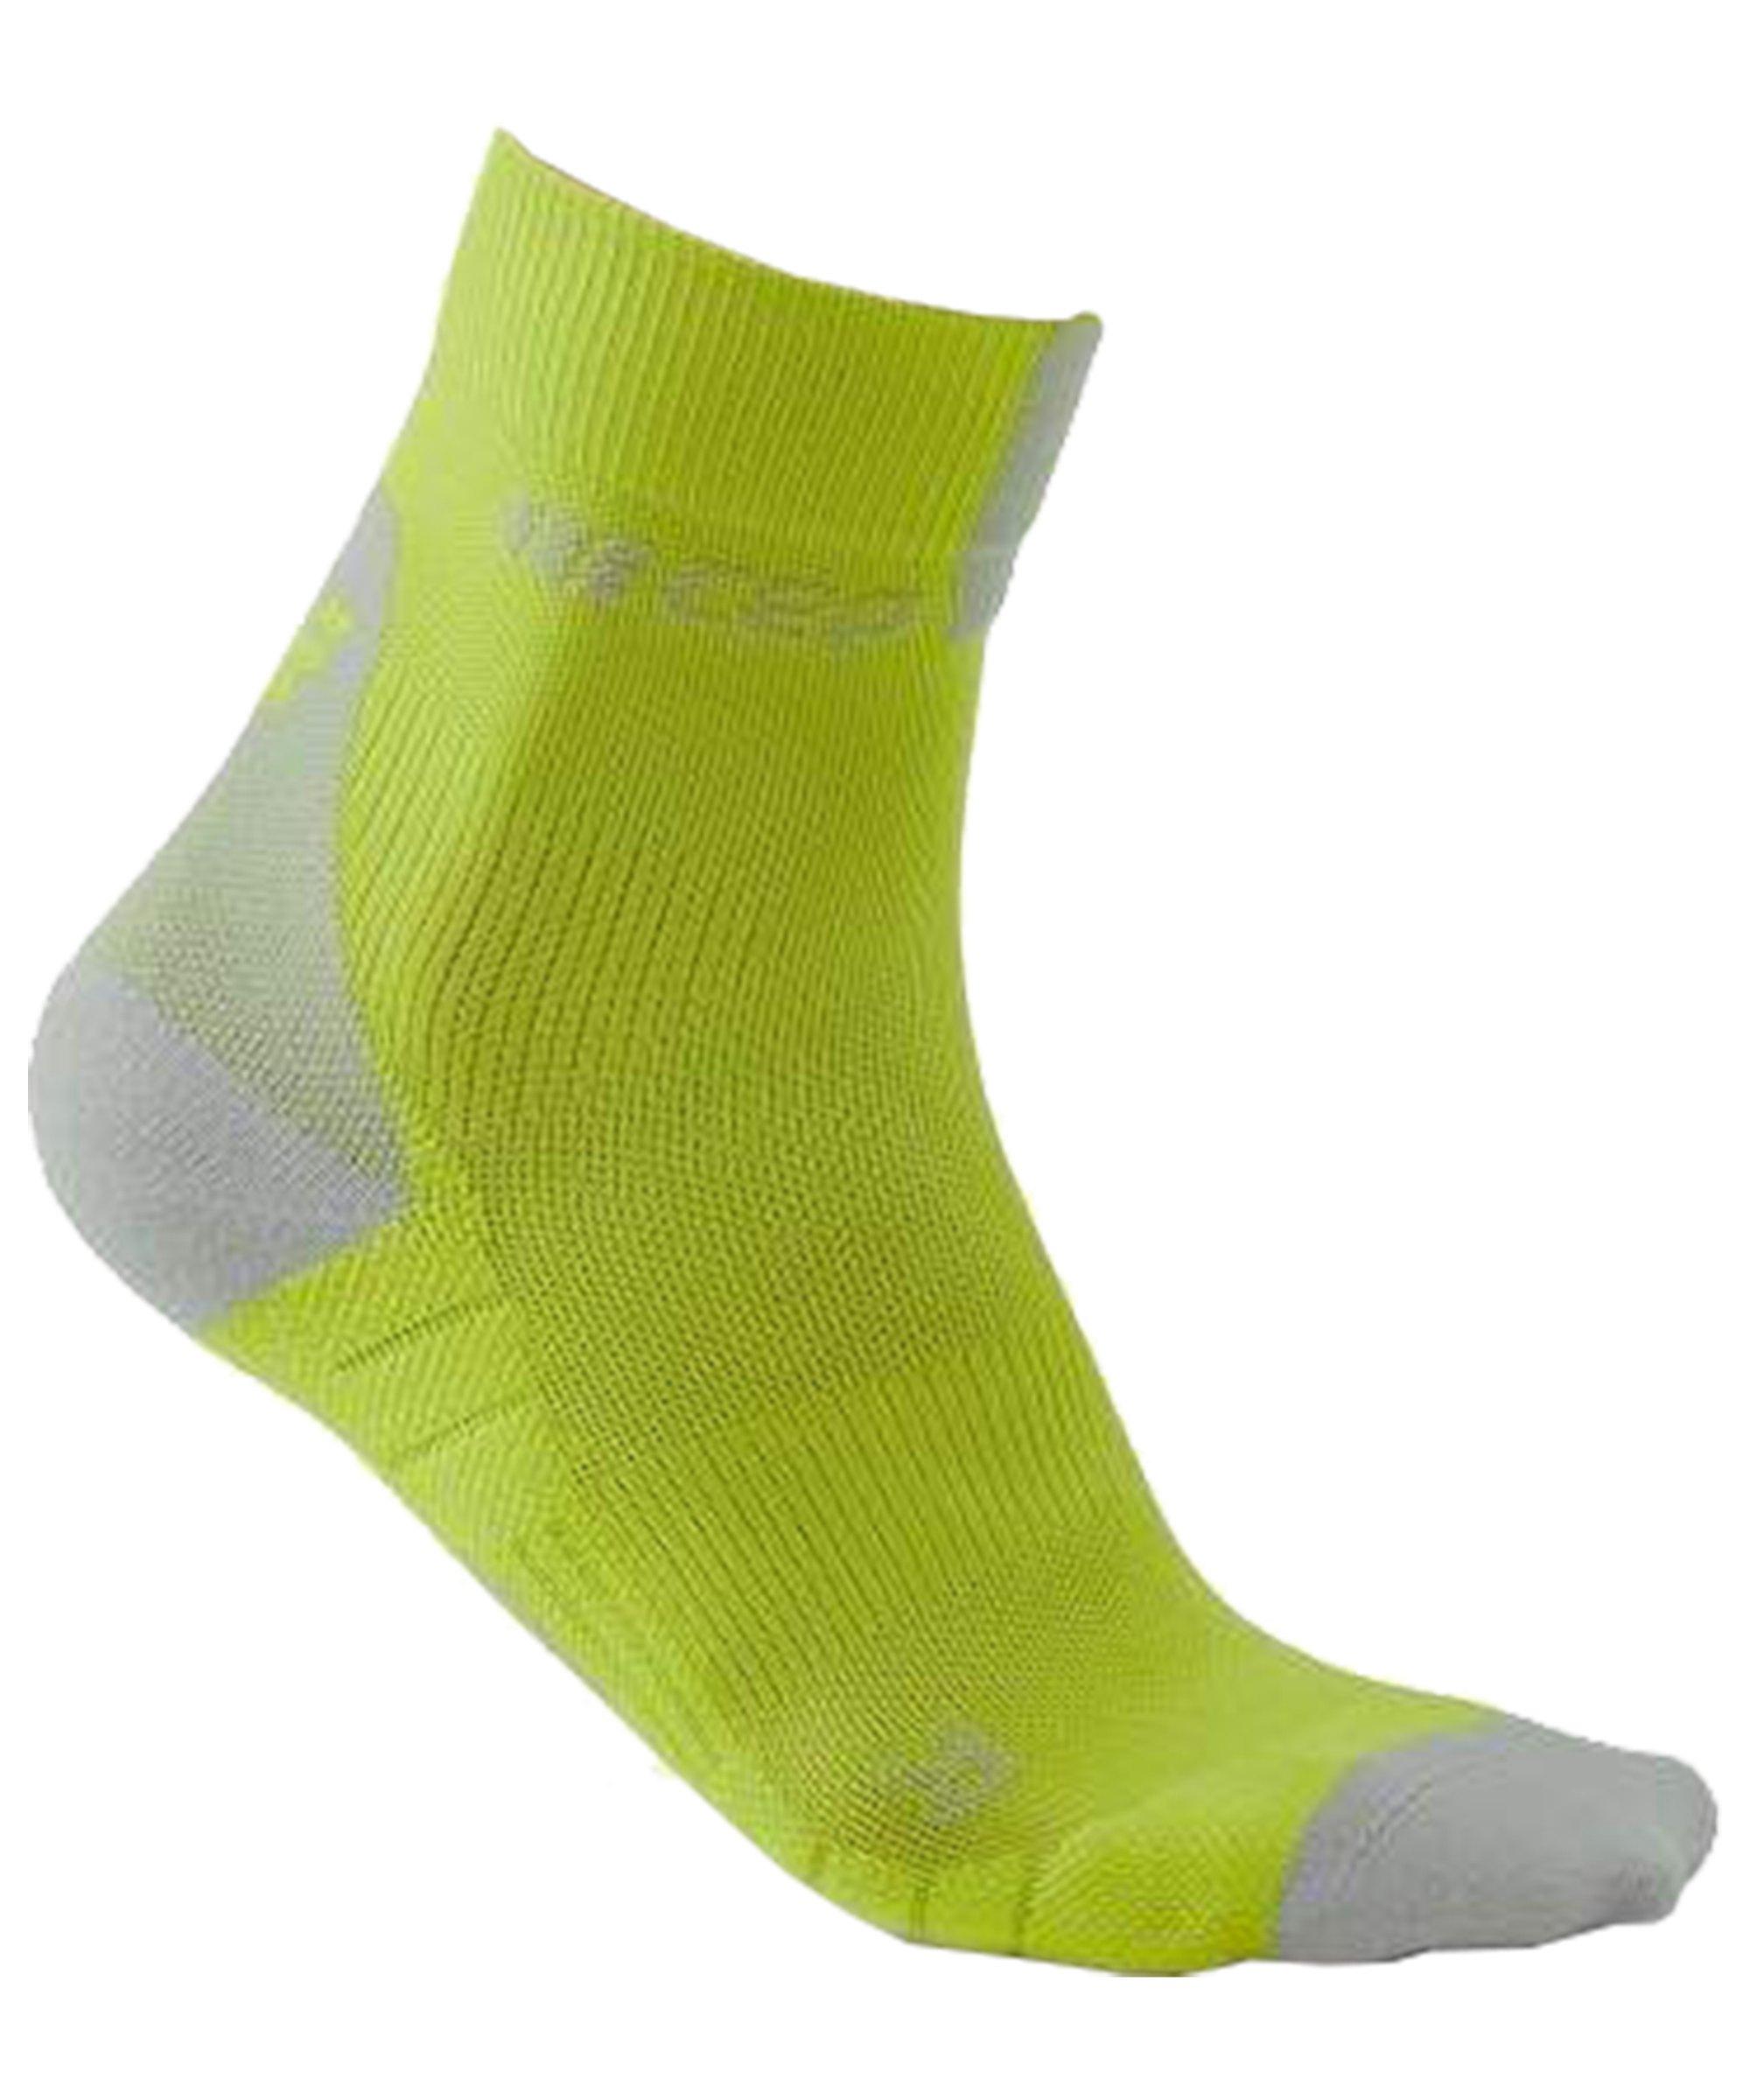 CEP Compression 3.0 Short Socken Running Gelb Grau - gelb